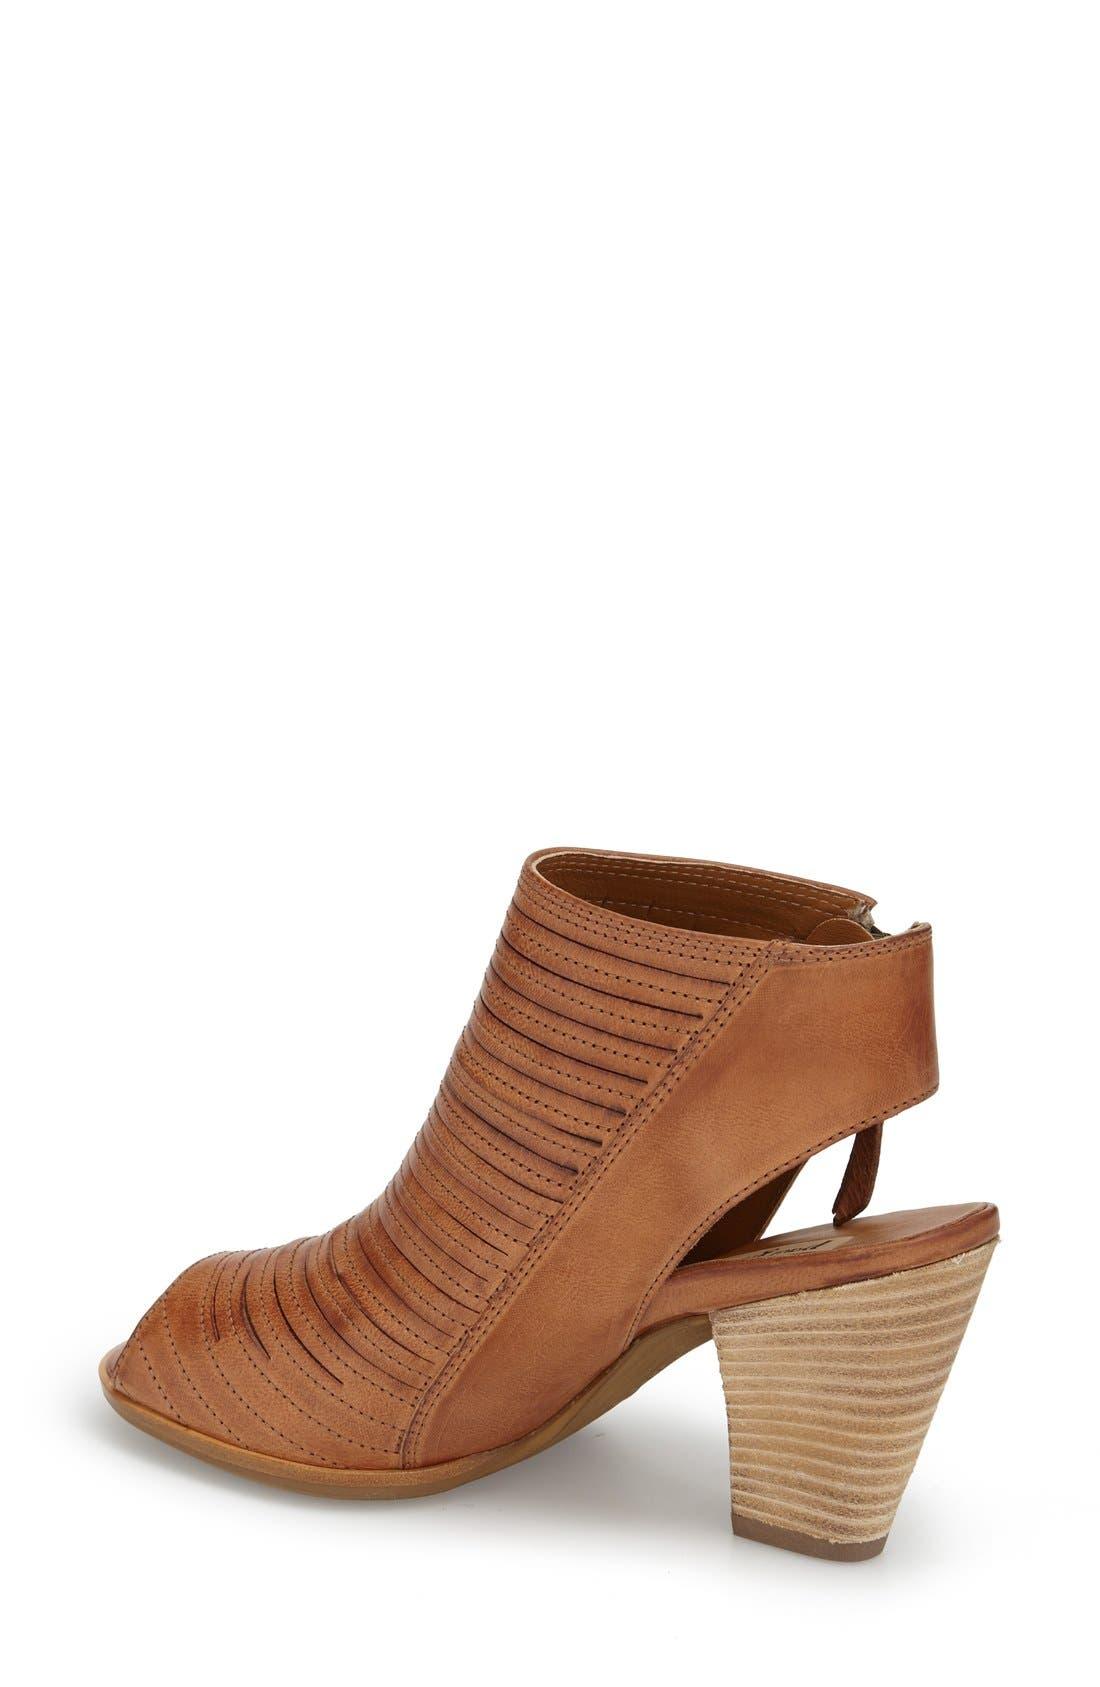 'Cayanne' Leather Peep Toe Sandal,                             Alternate thumbnail 13, color,